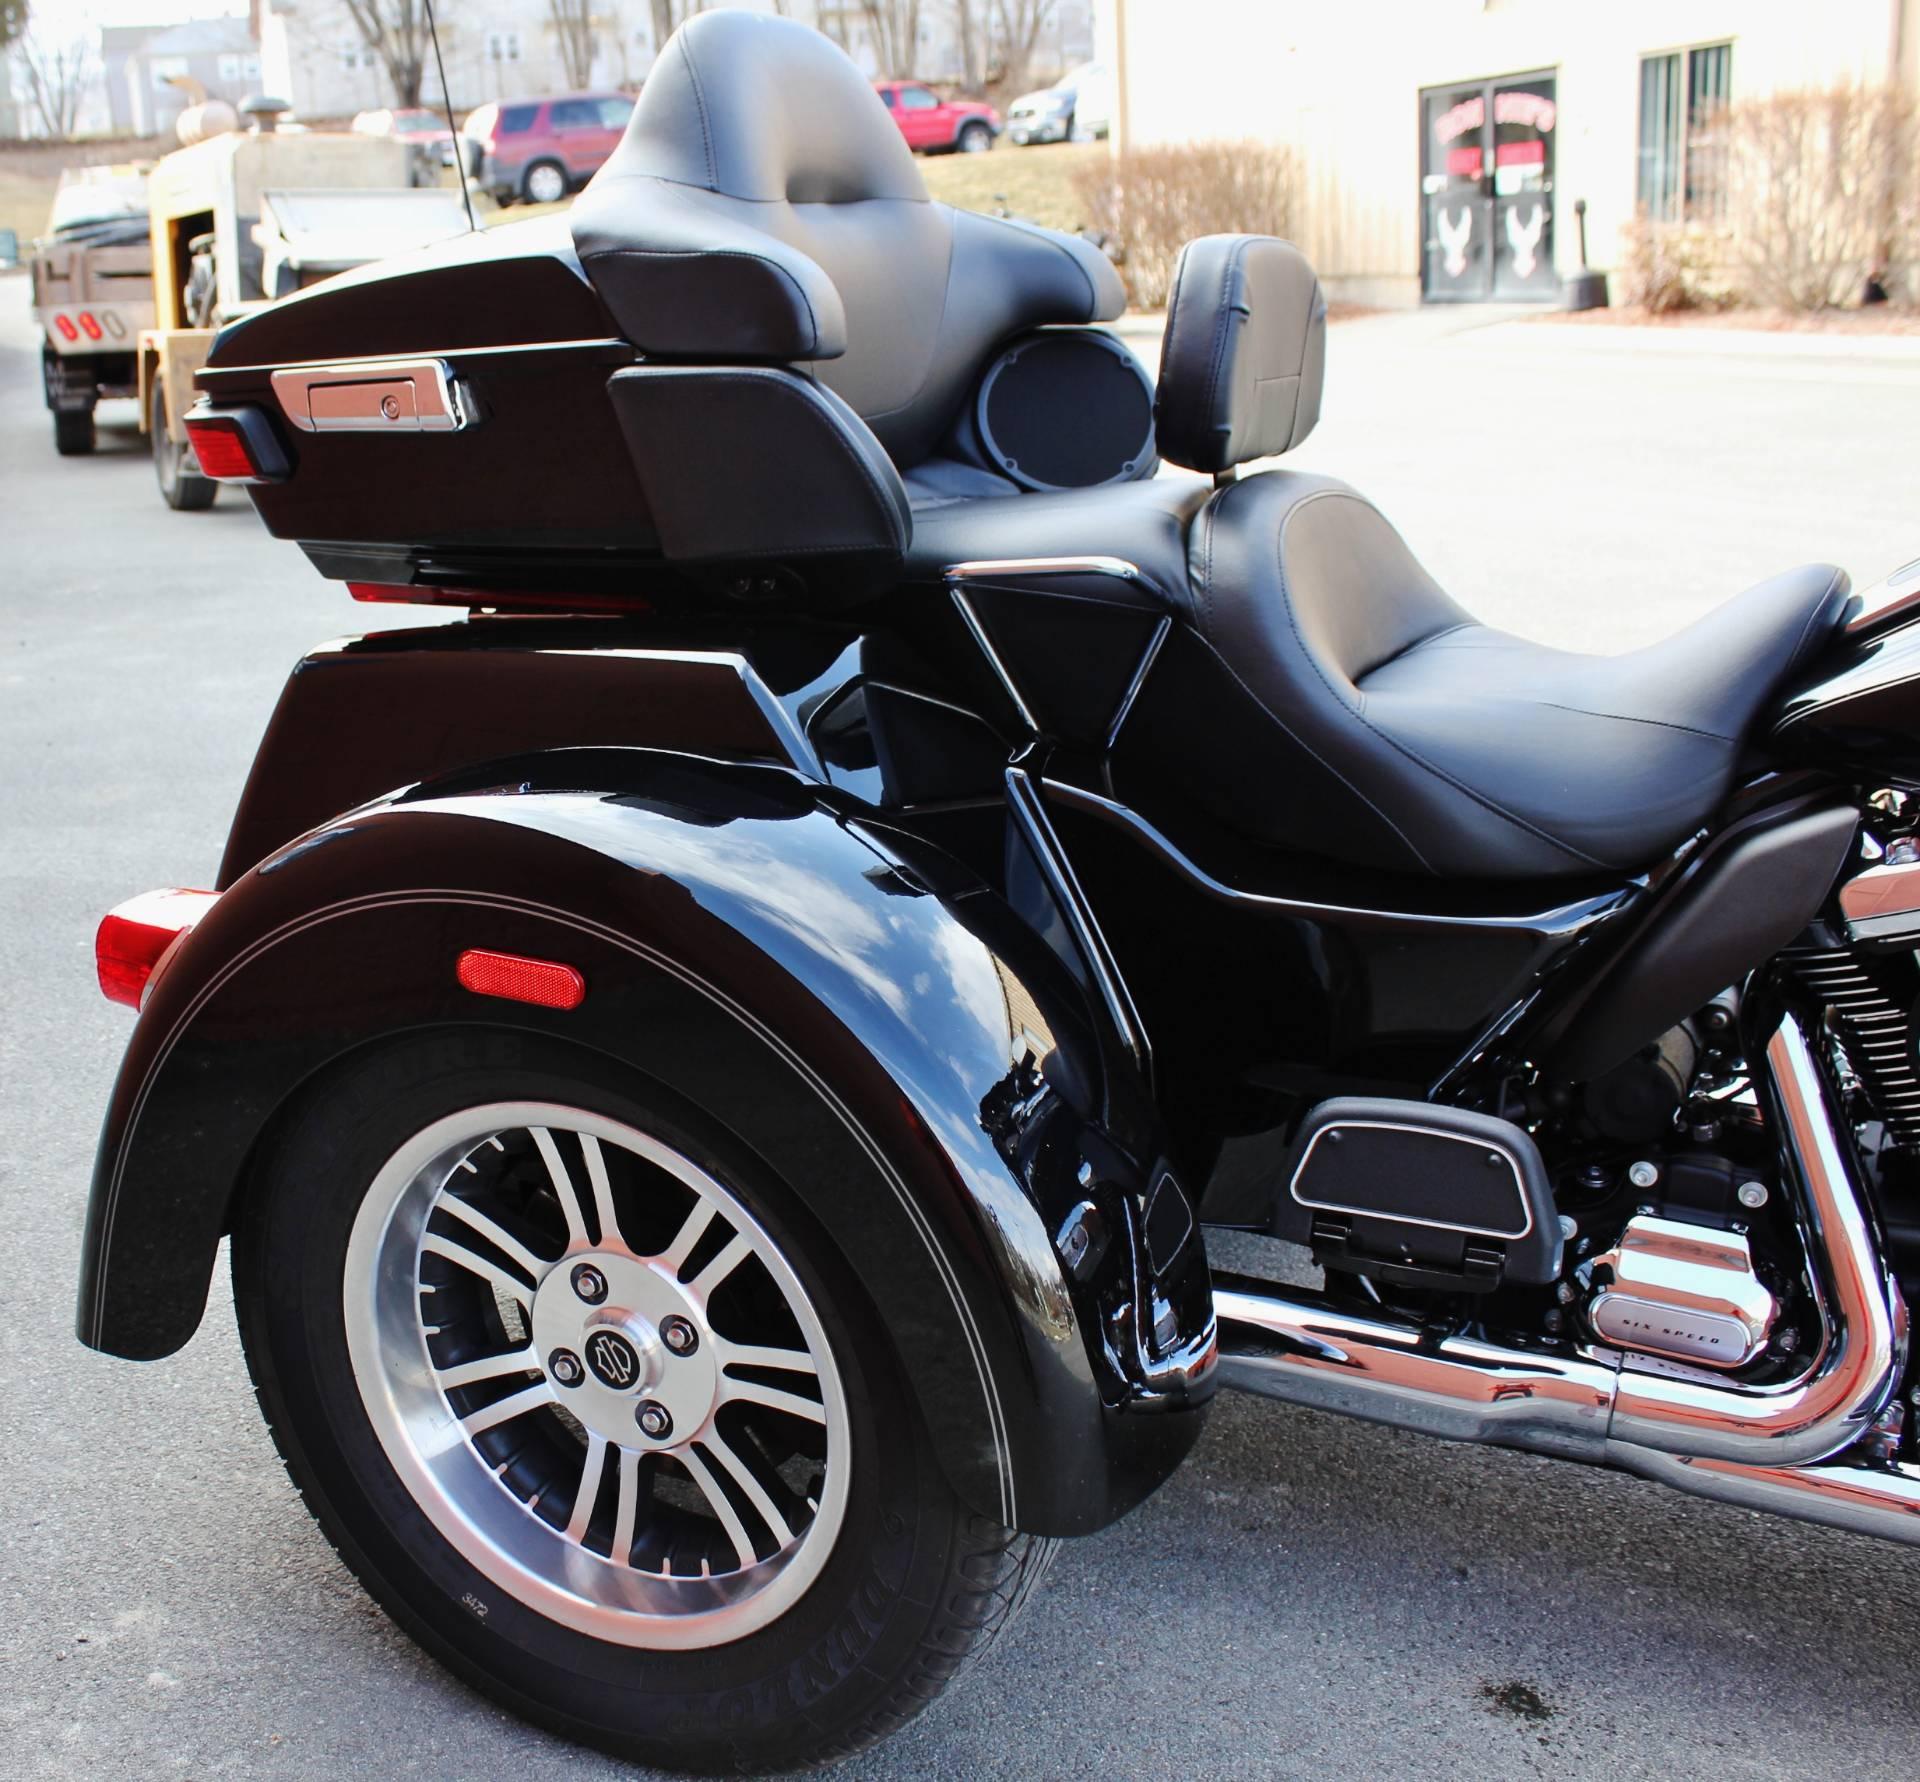 Used 2017 Harley Davidson Tri Glide Ultra Trikes In Adams Ma